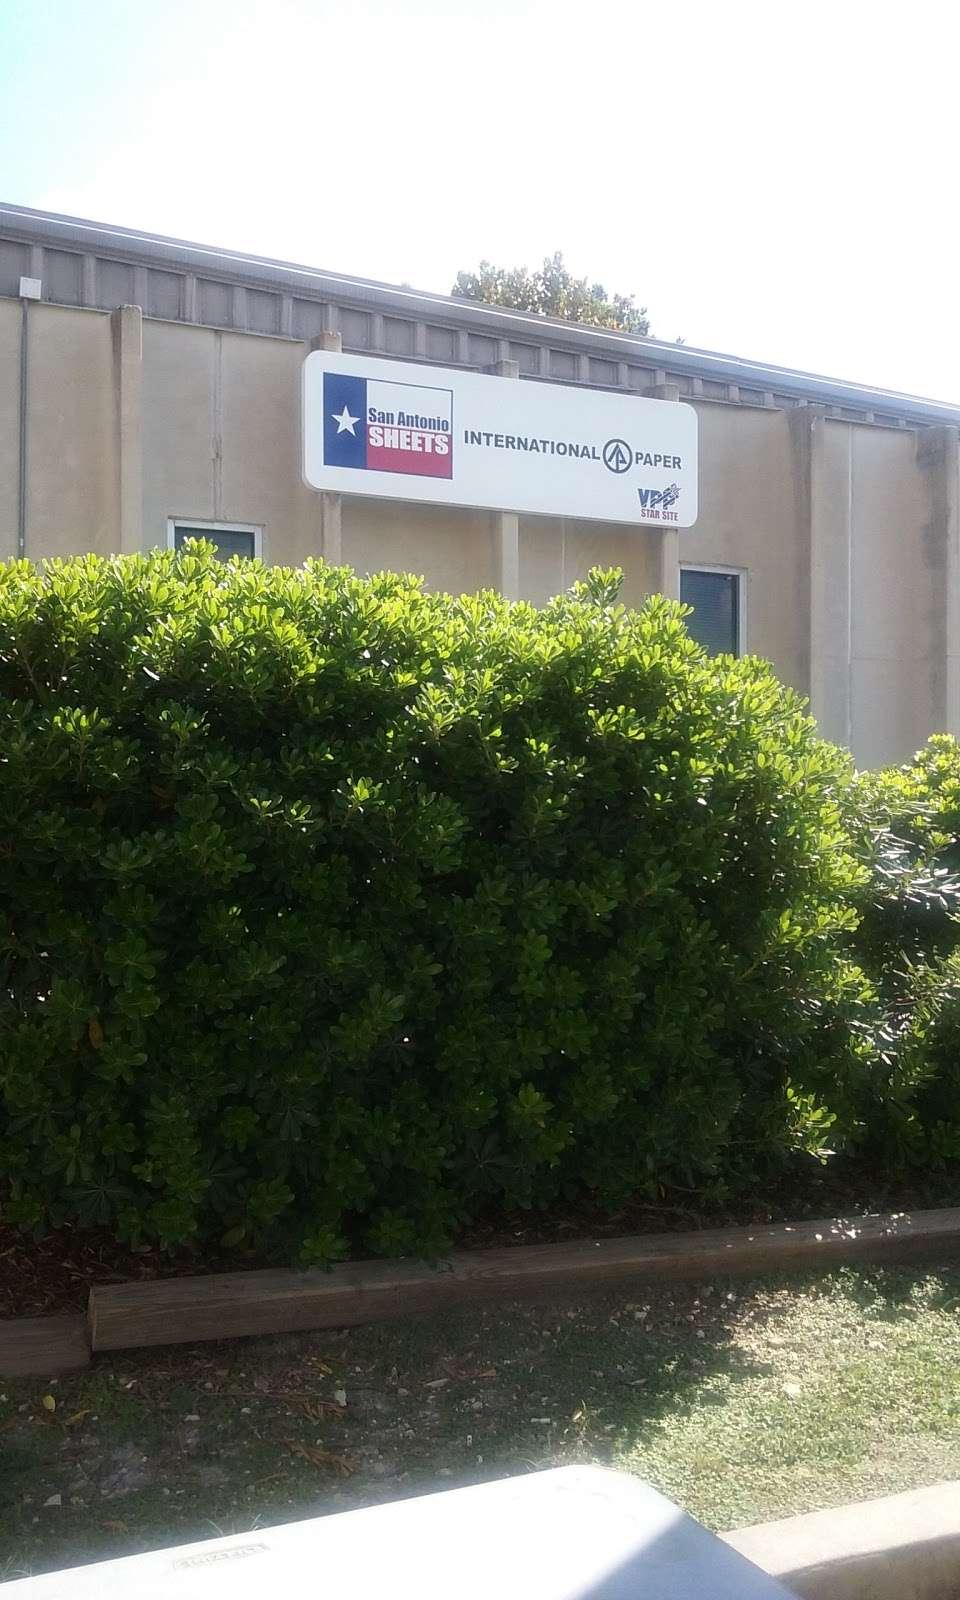 International Paper - store  | Photo 5 of 9 | Address: 610 Pop Gunn St, San Antonio, TX 78219, USA | Phone: (210) 661-8543